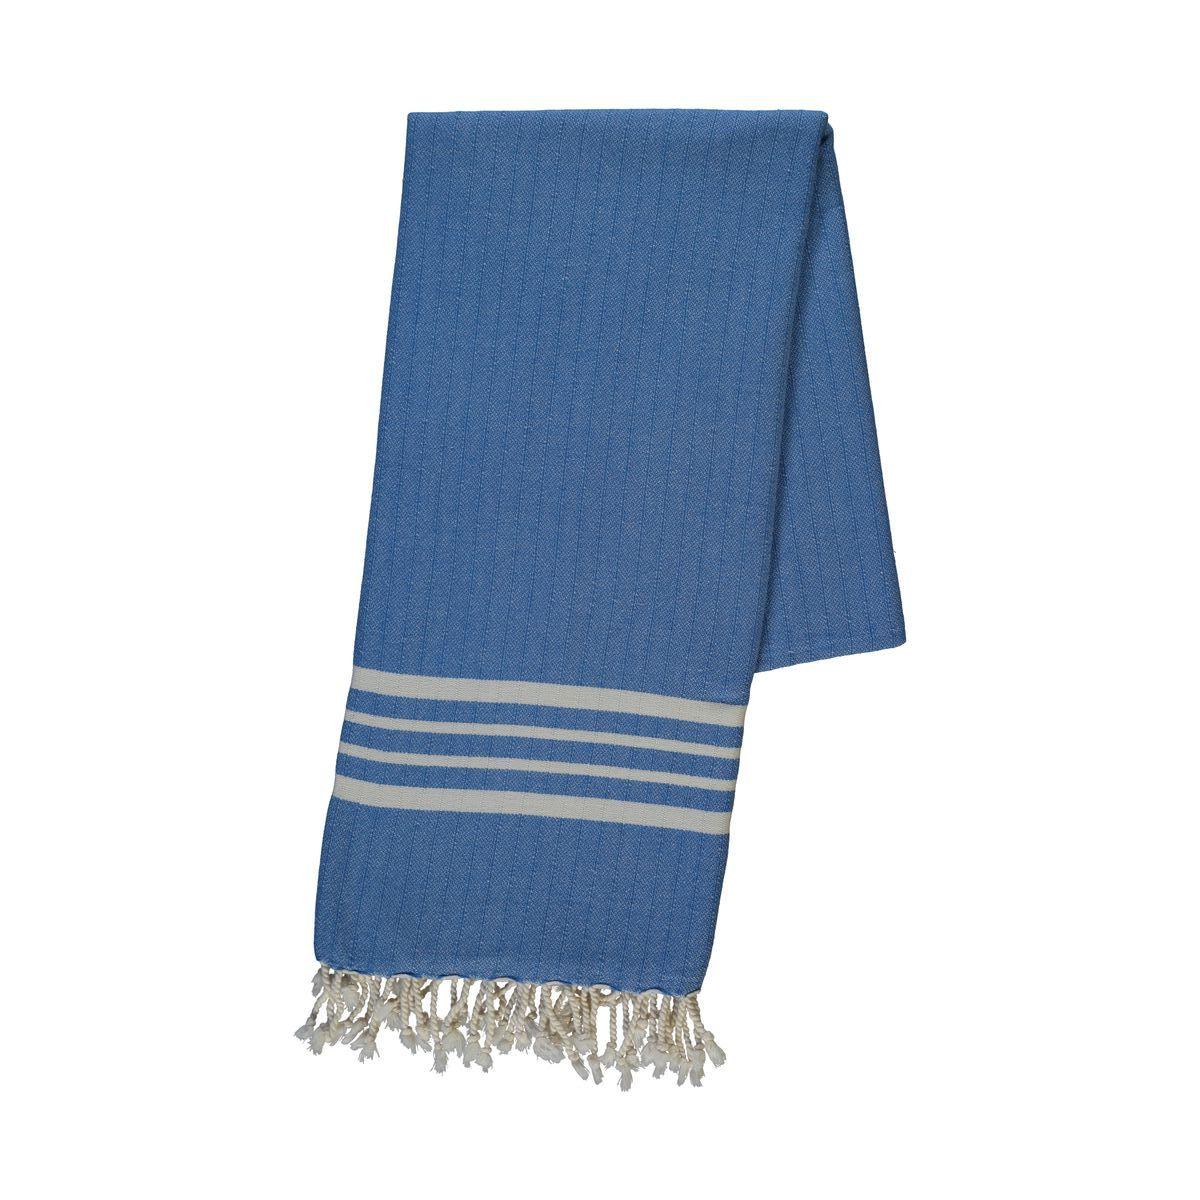 Peştemal Sultan - Koyu Mavi